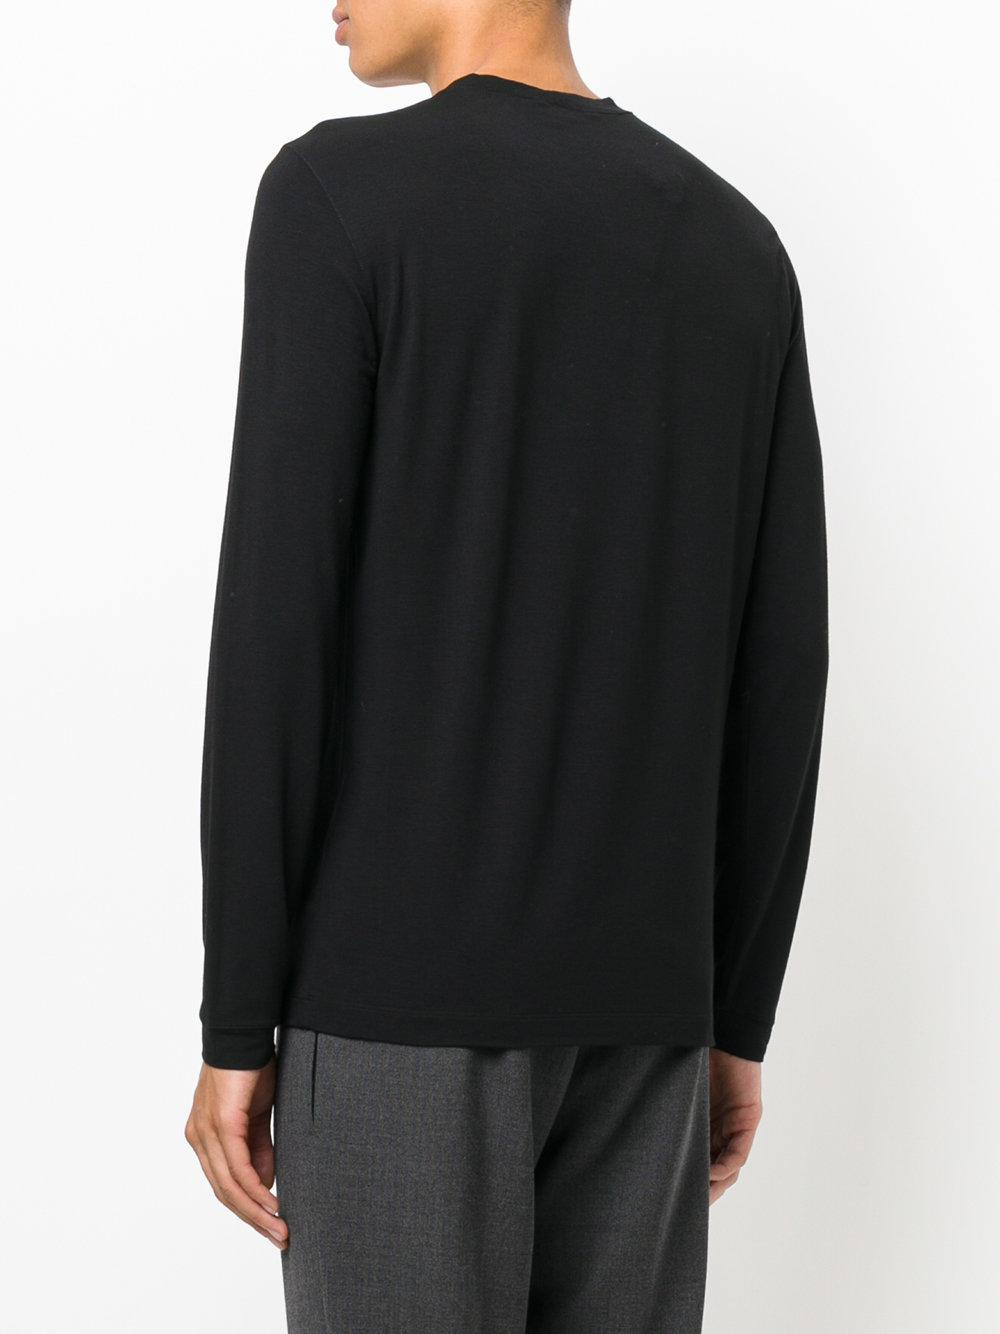 Lyst Giorgio Armani Long Sleeve T Shirt In Black For Men